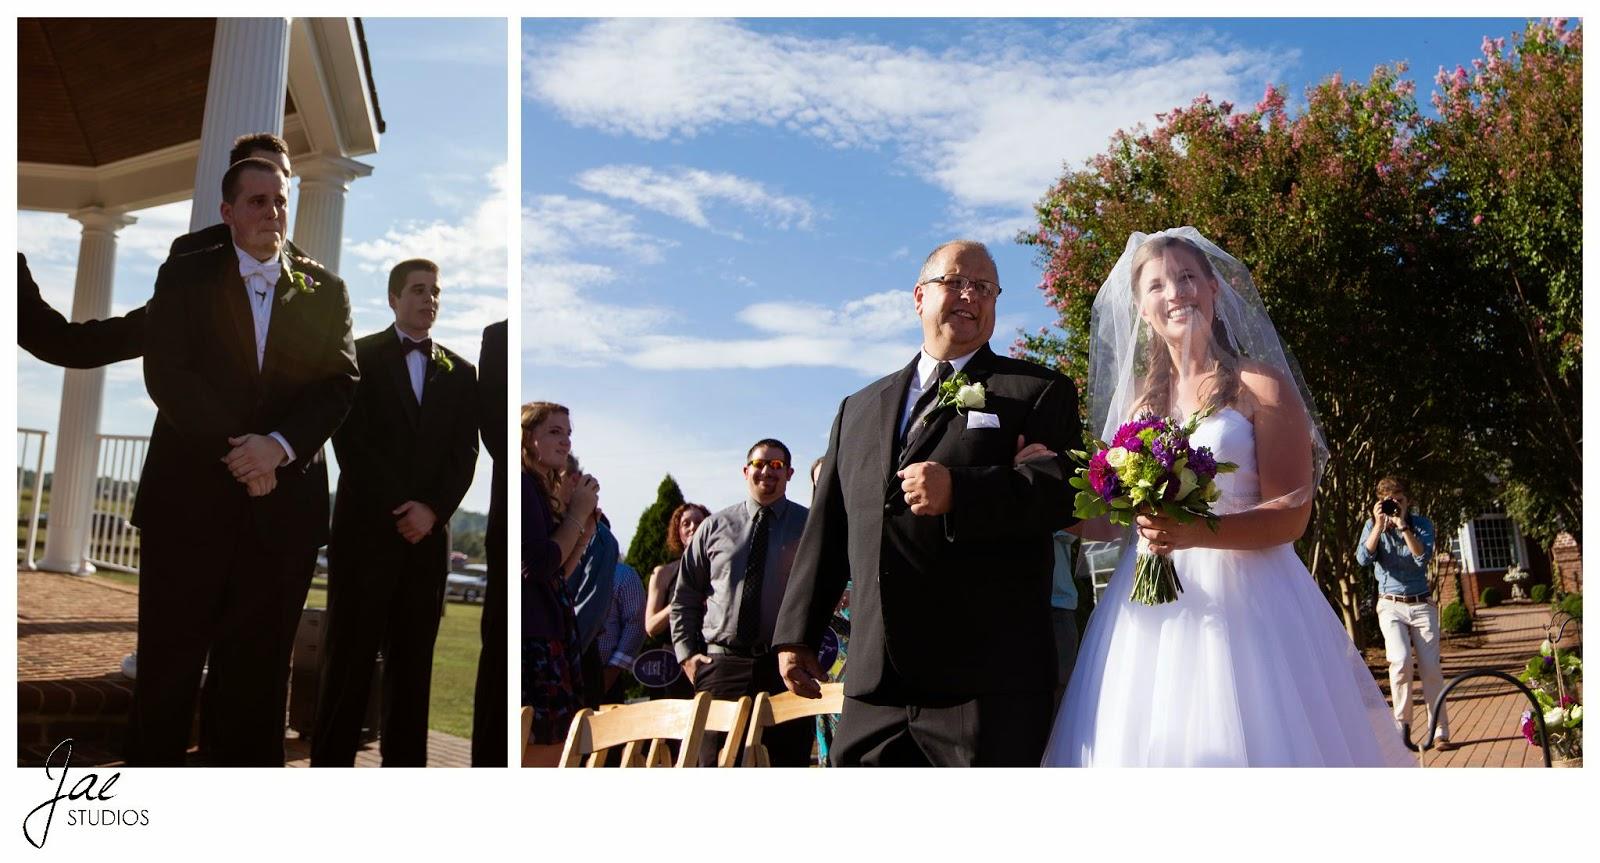 Jonathan and Julie, Bird cage, West Manor Estate, Wedding, Lynchburg, Virginia, Jae Studios, sky, wedding dress, tuxedo, flowers, bouquet, boutonniere, bow tie, waiting, father, groomsmen